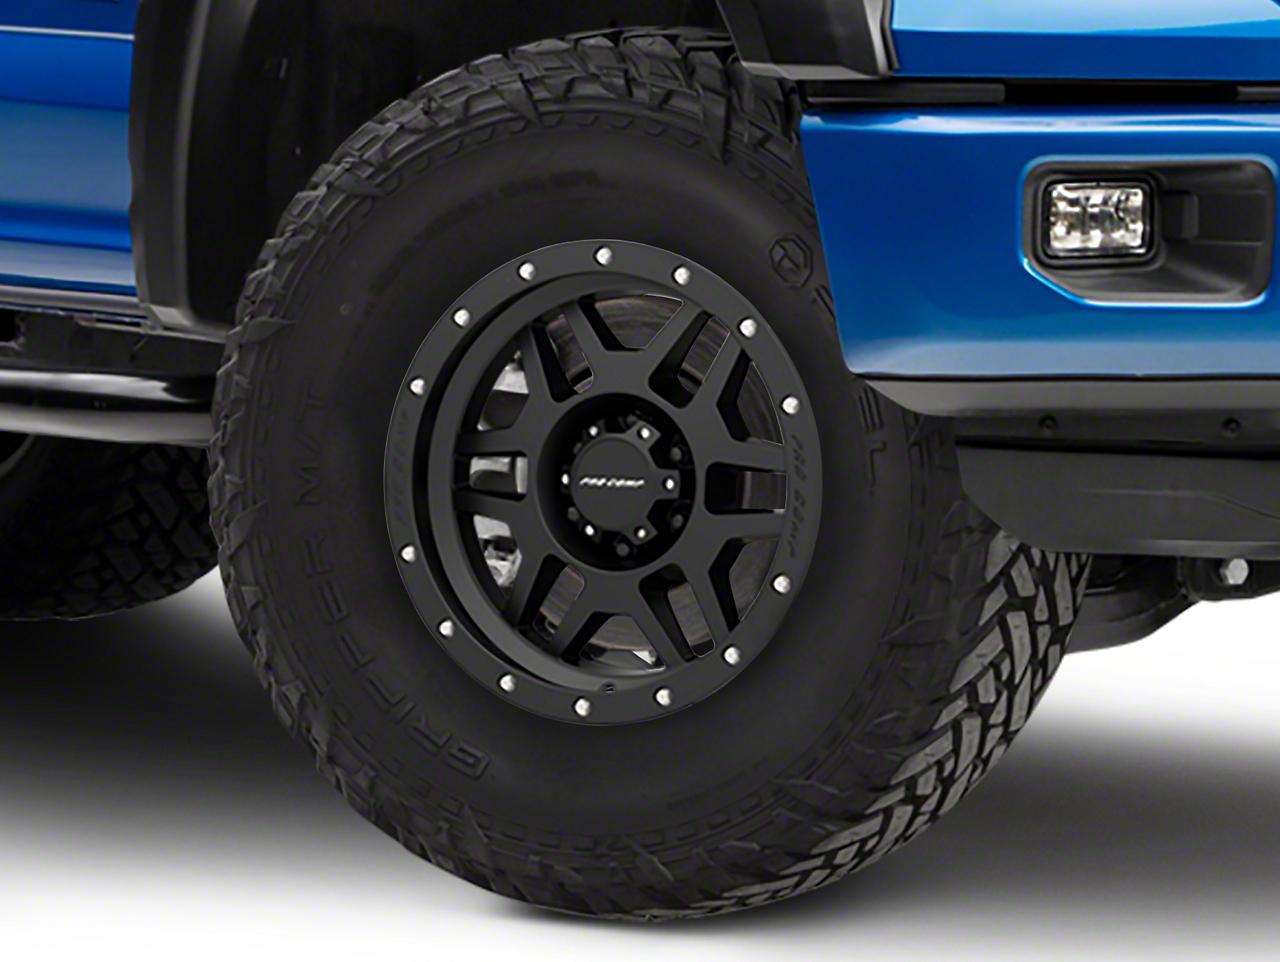 Pro Comp Phaser Satin Black 6-Lug Wheel - 18x9 (04-18 F-150)